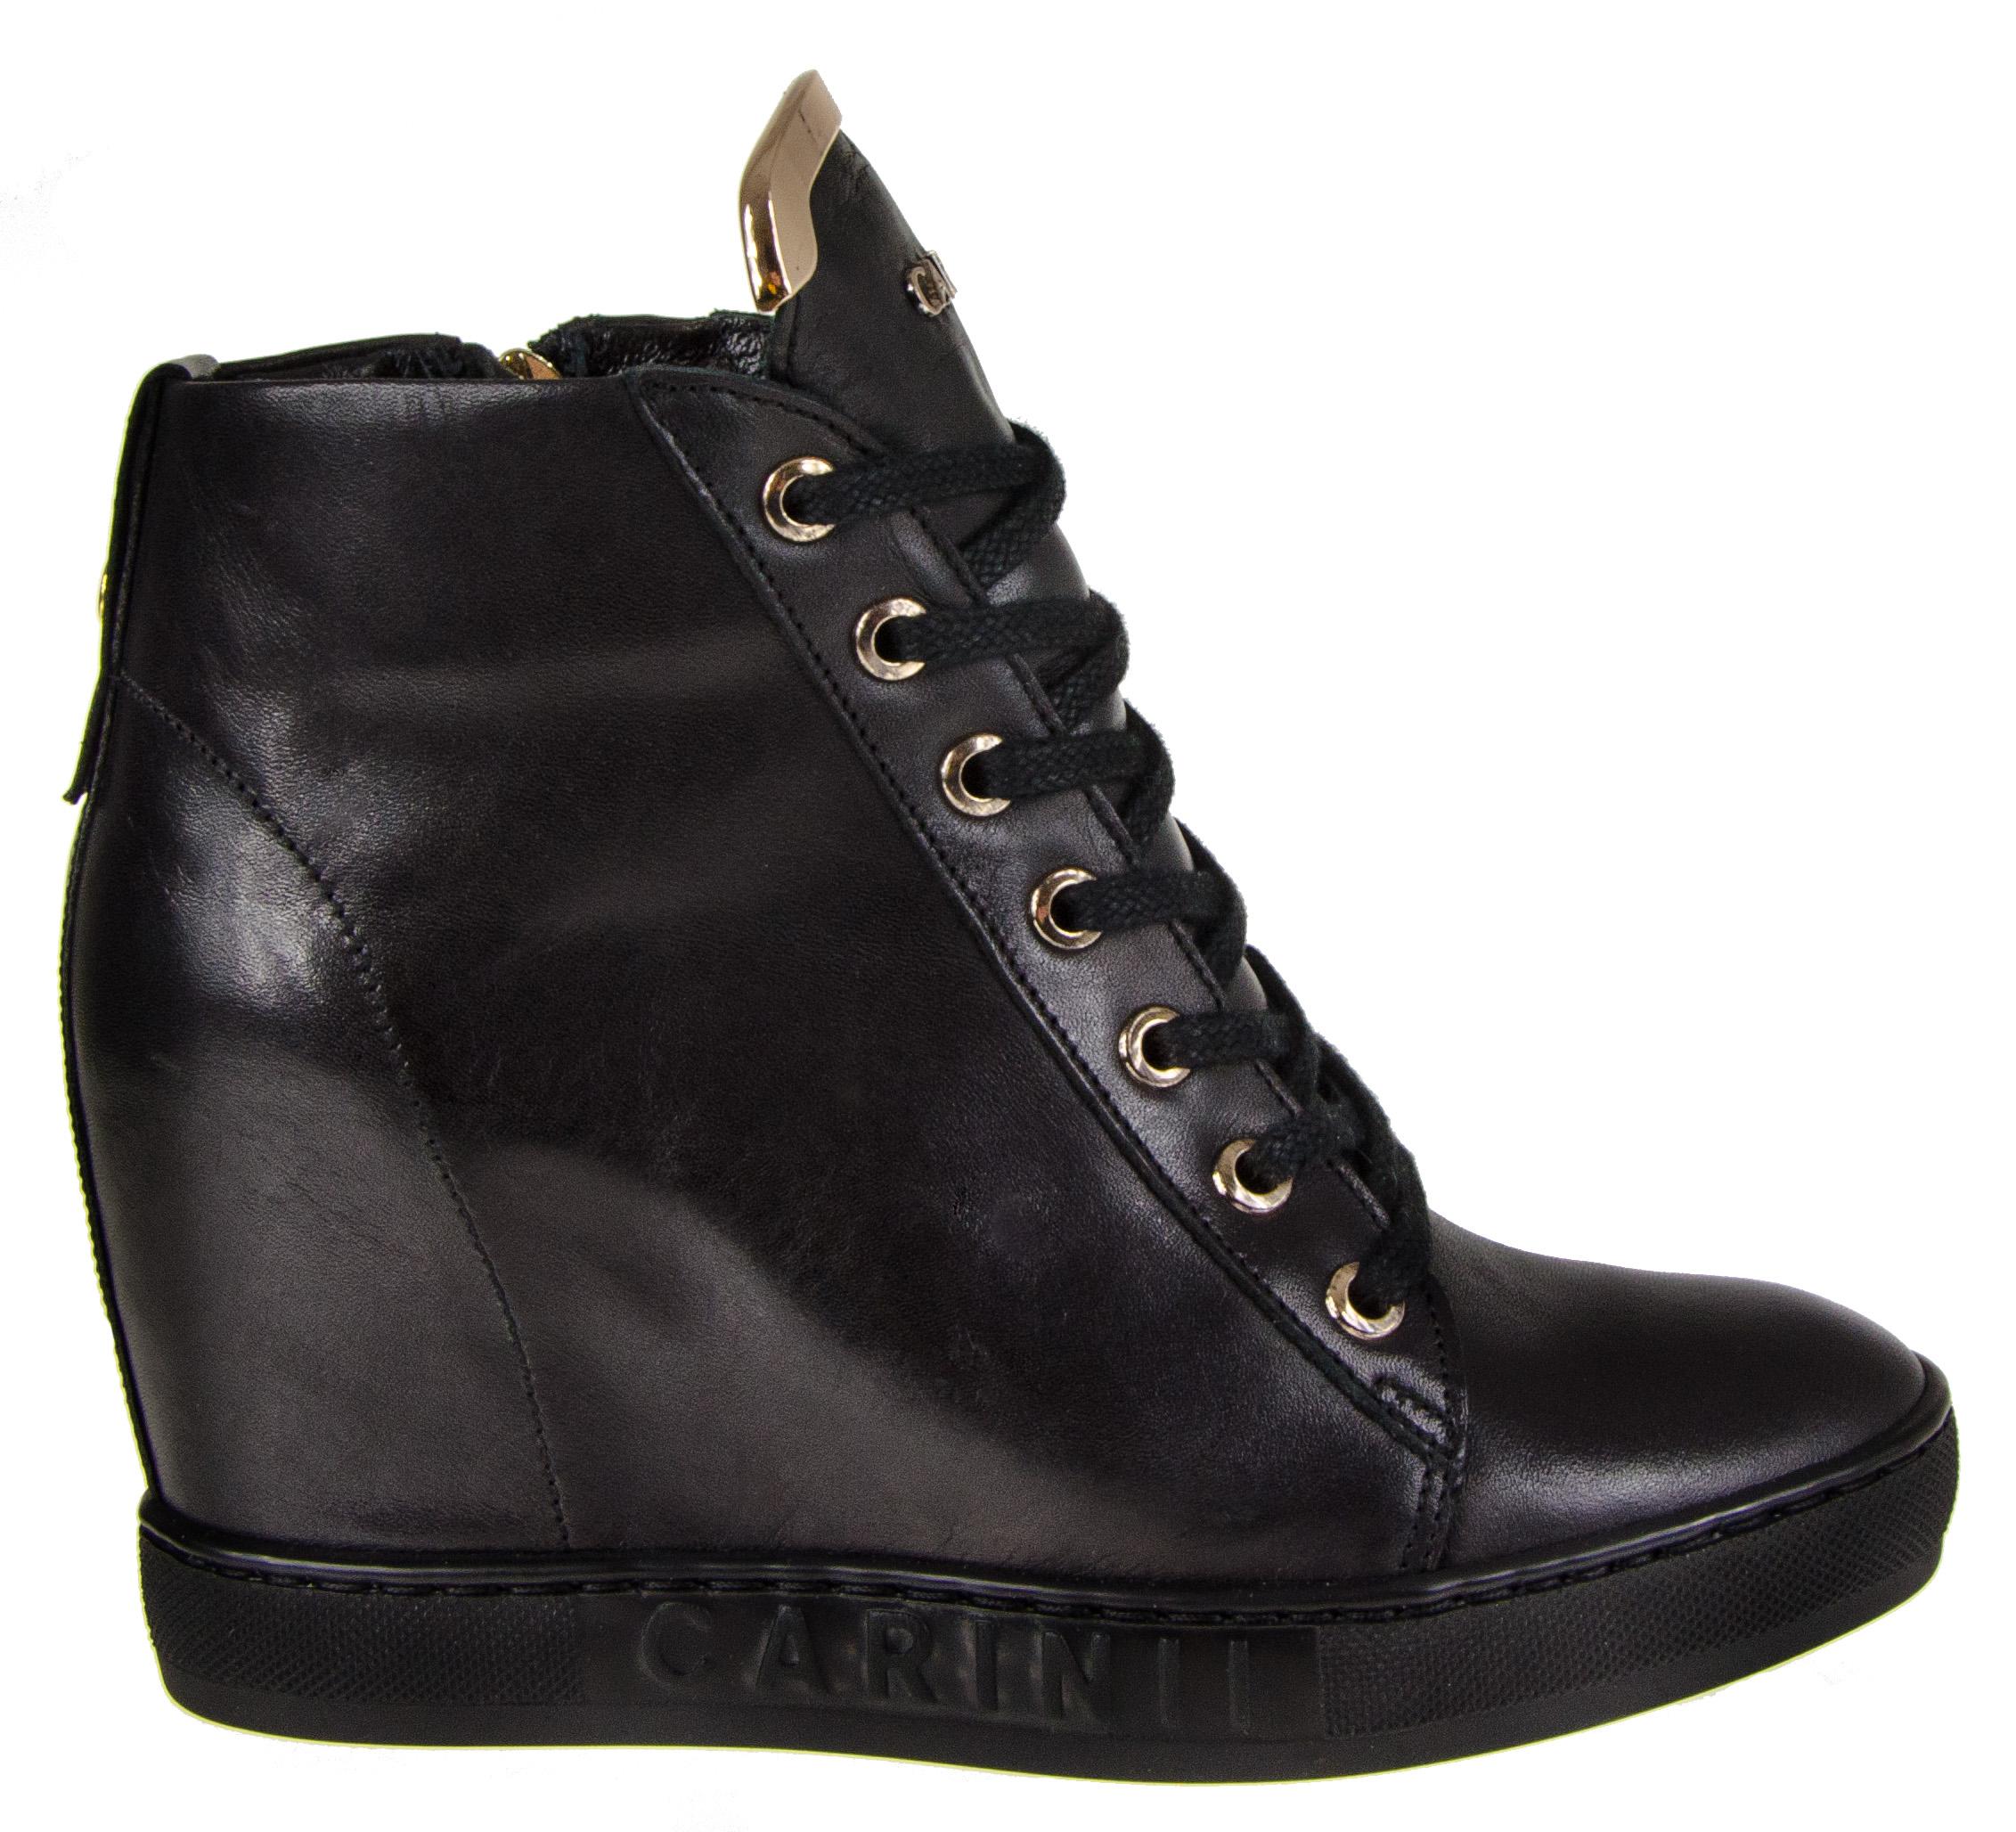 238116c31ad5c B4078 Skóra Sneakersy Czarne Botki 7153070714 Koturn Carinii BPqdq